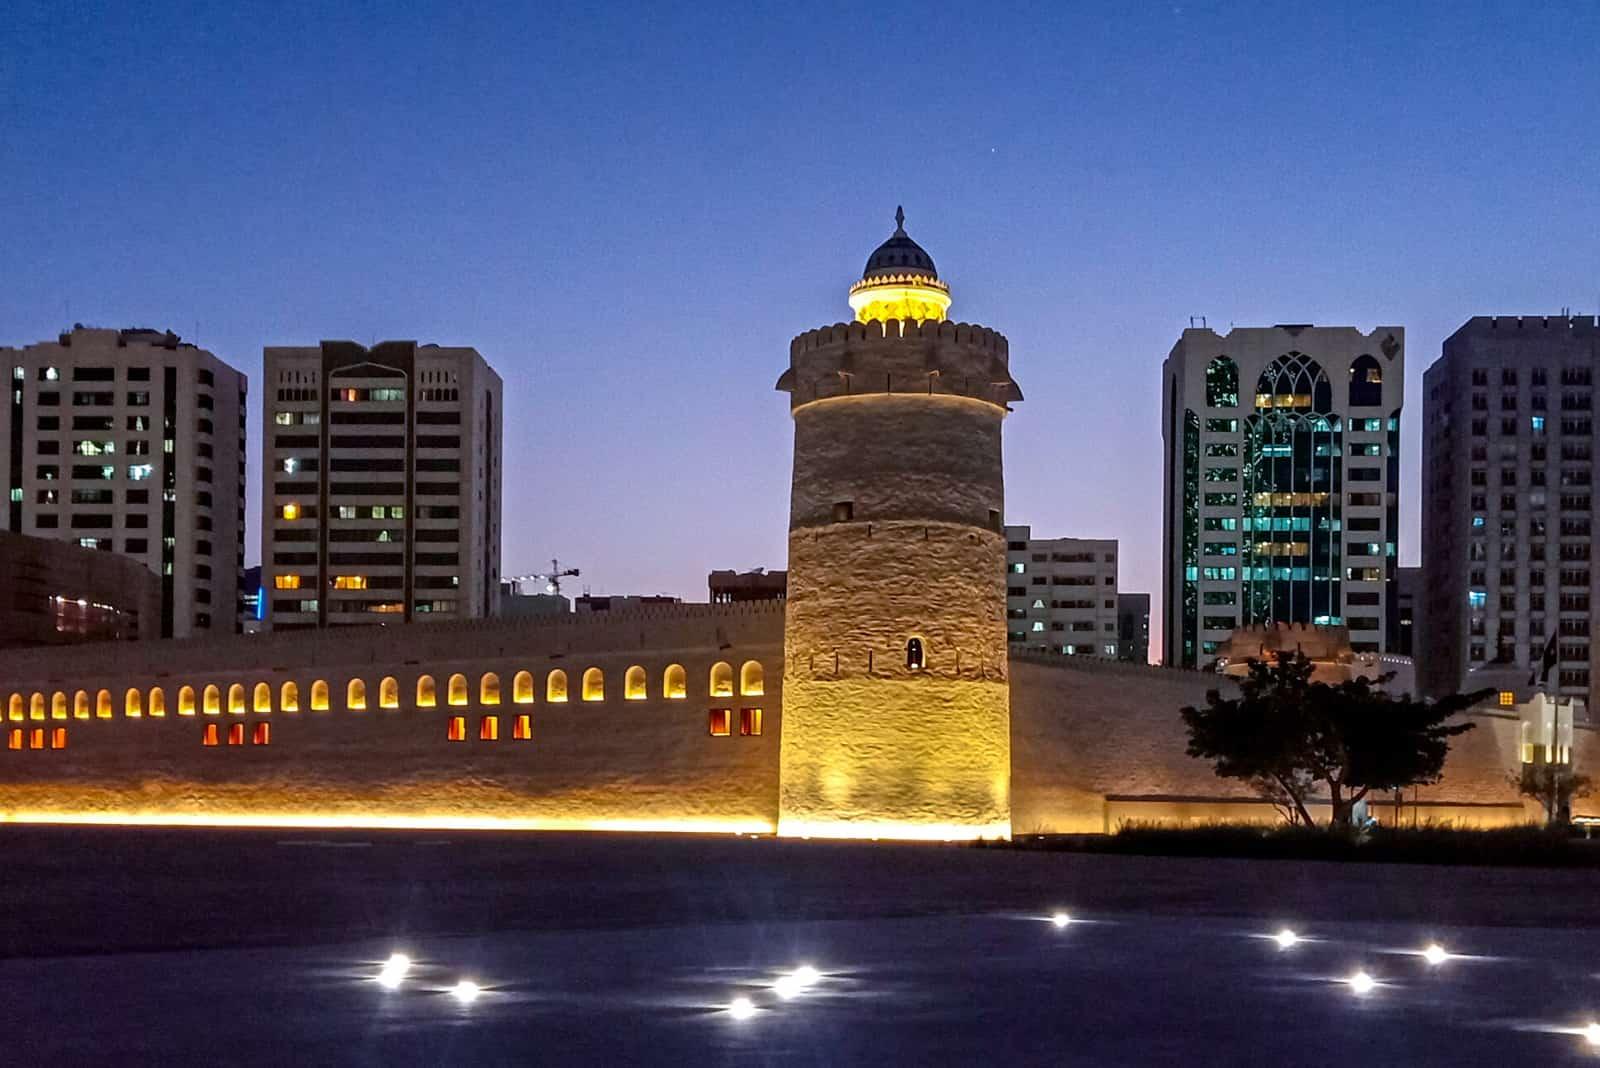 QASR AL HOSN – ABU DHABI, UAE